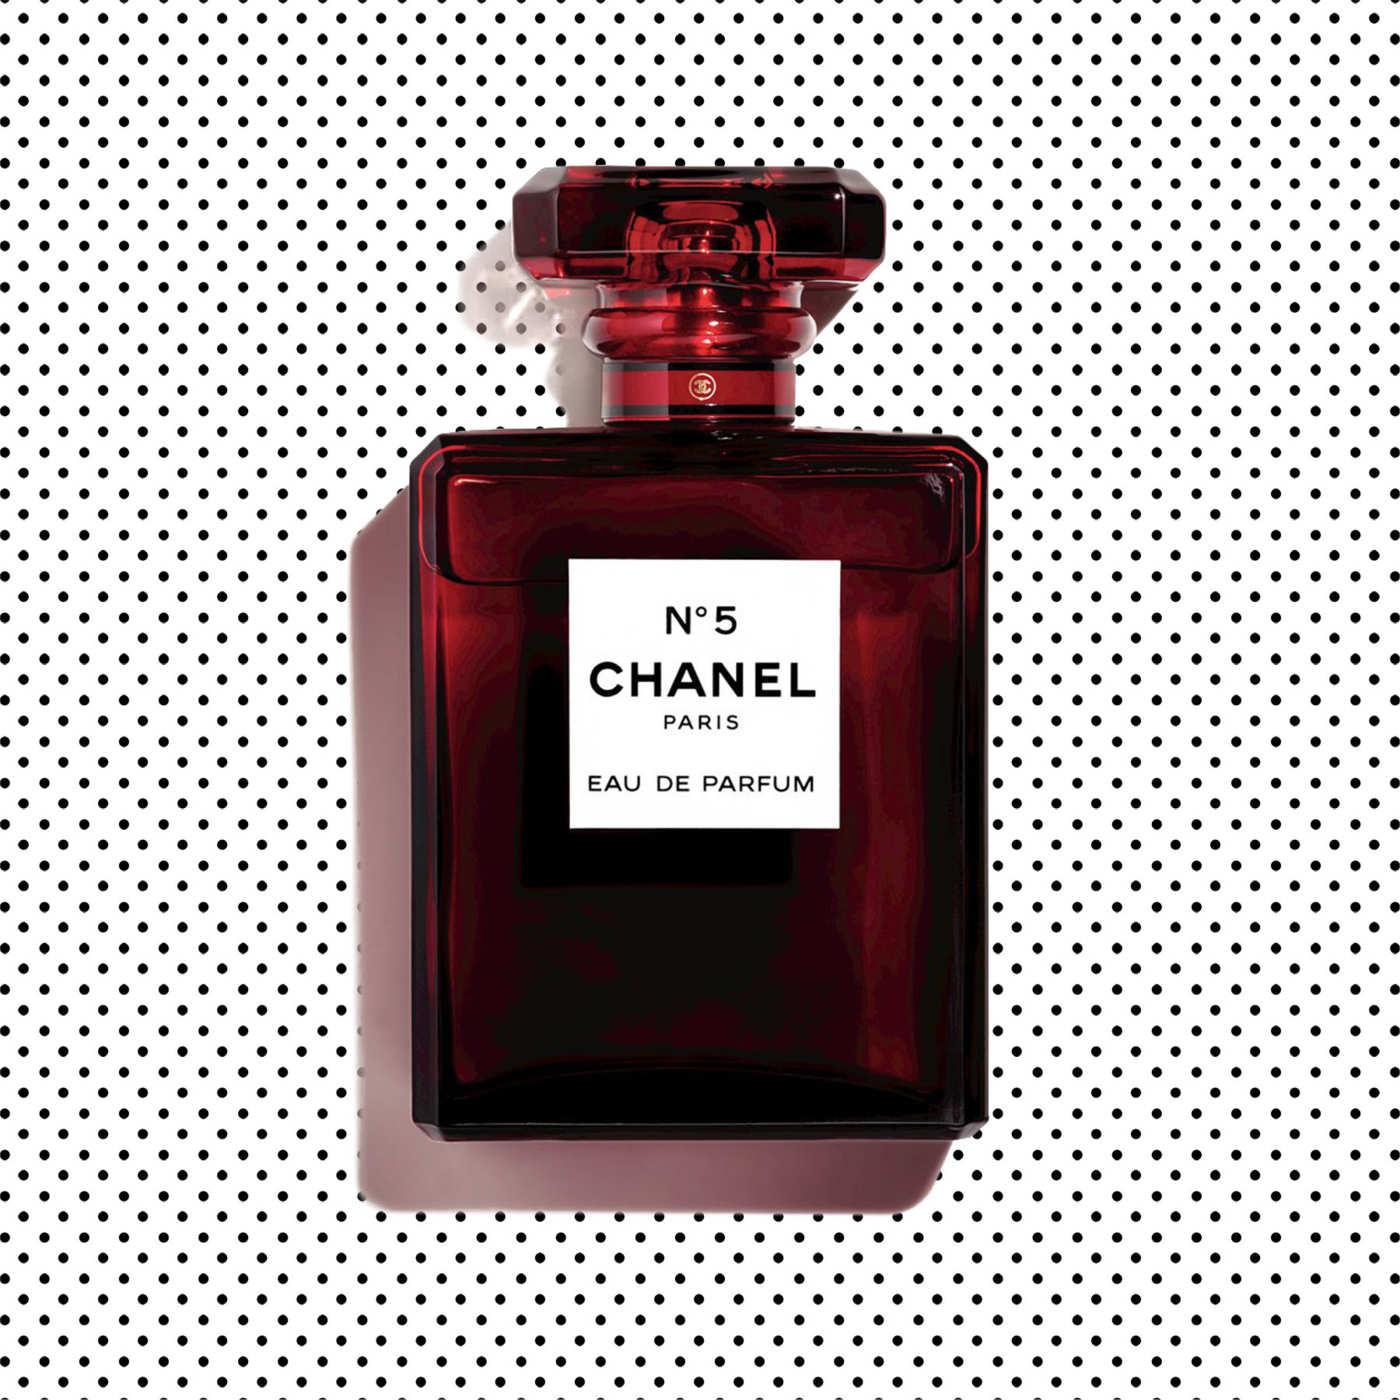 buy popular a93de 4ee40 絕美紅色包裝! Chanel N°5香水首次推出限定紅色限量版| Zip Magazine